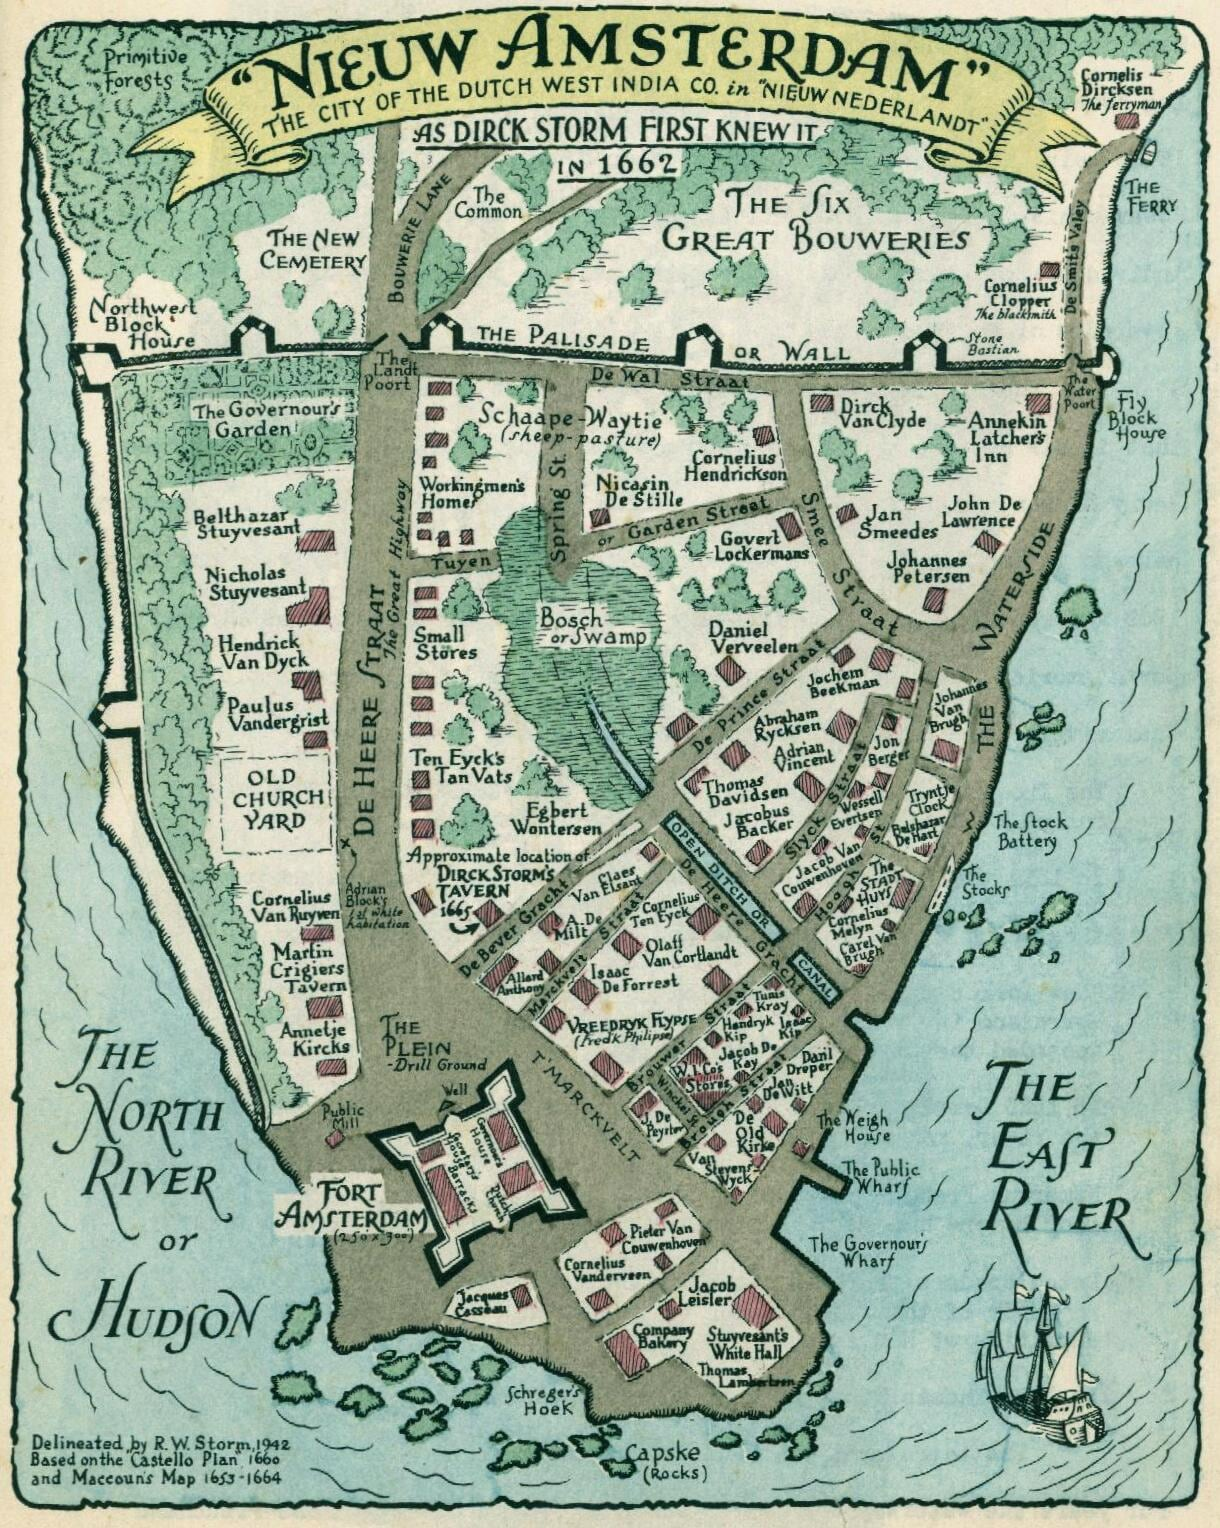 New Amsterdam (1662)